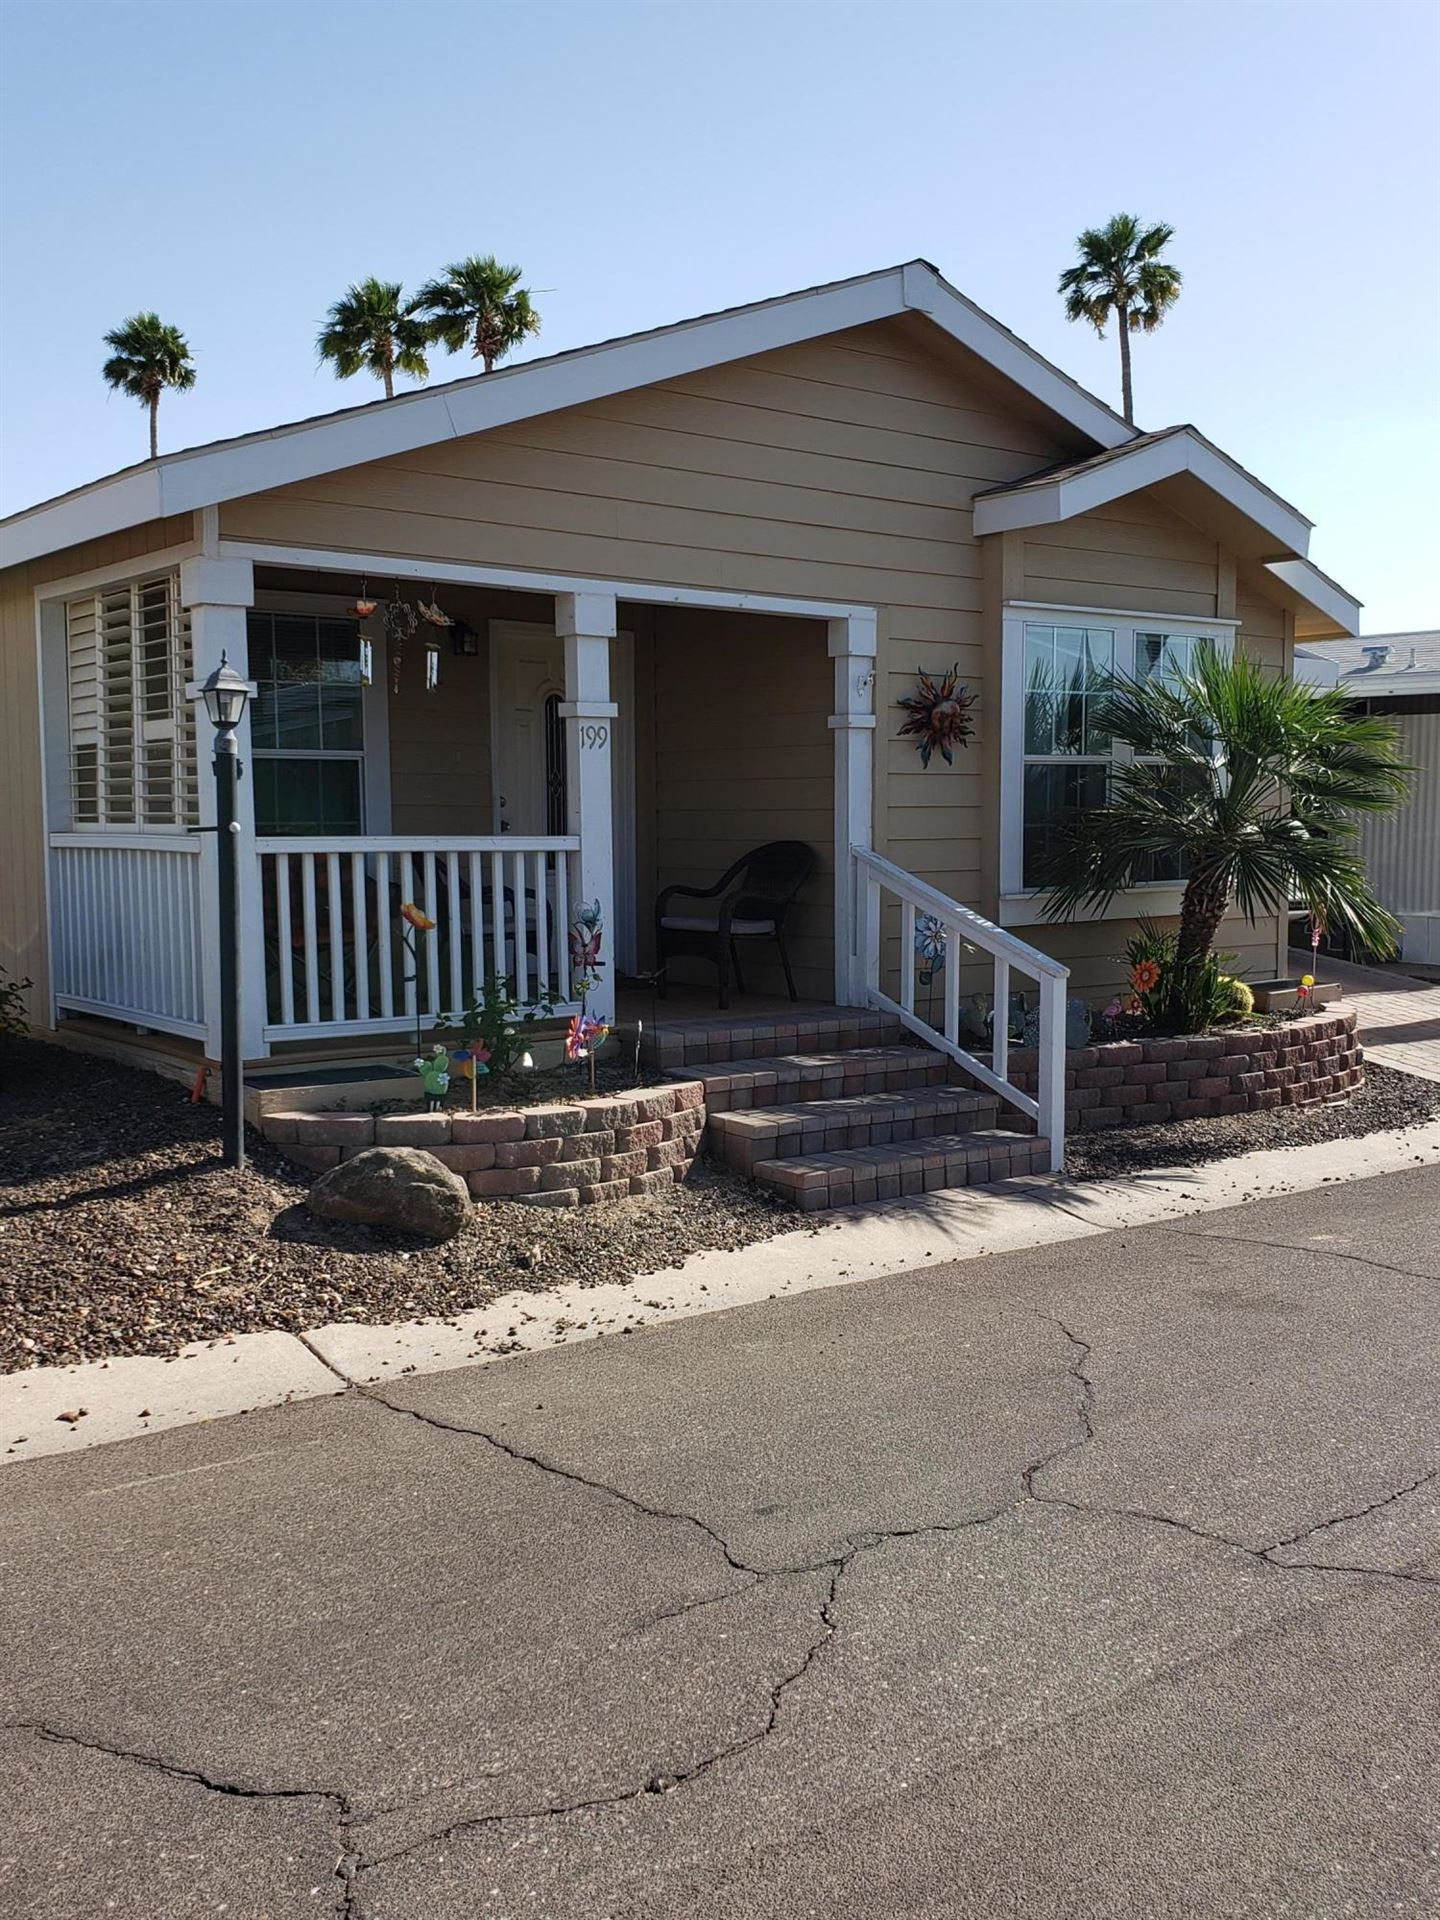 11411 N 91ST Avenue #199, Peoria, AZ 85345 - MLS#: 6234043